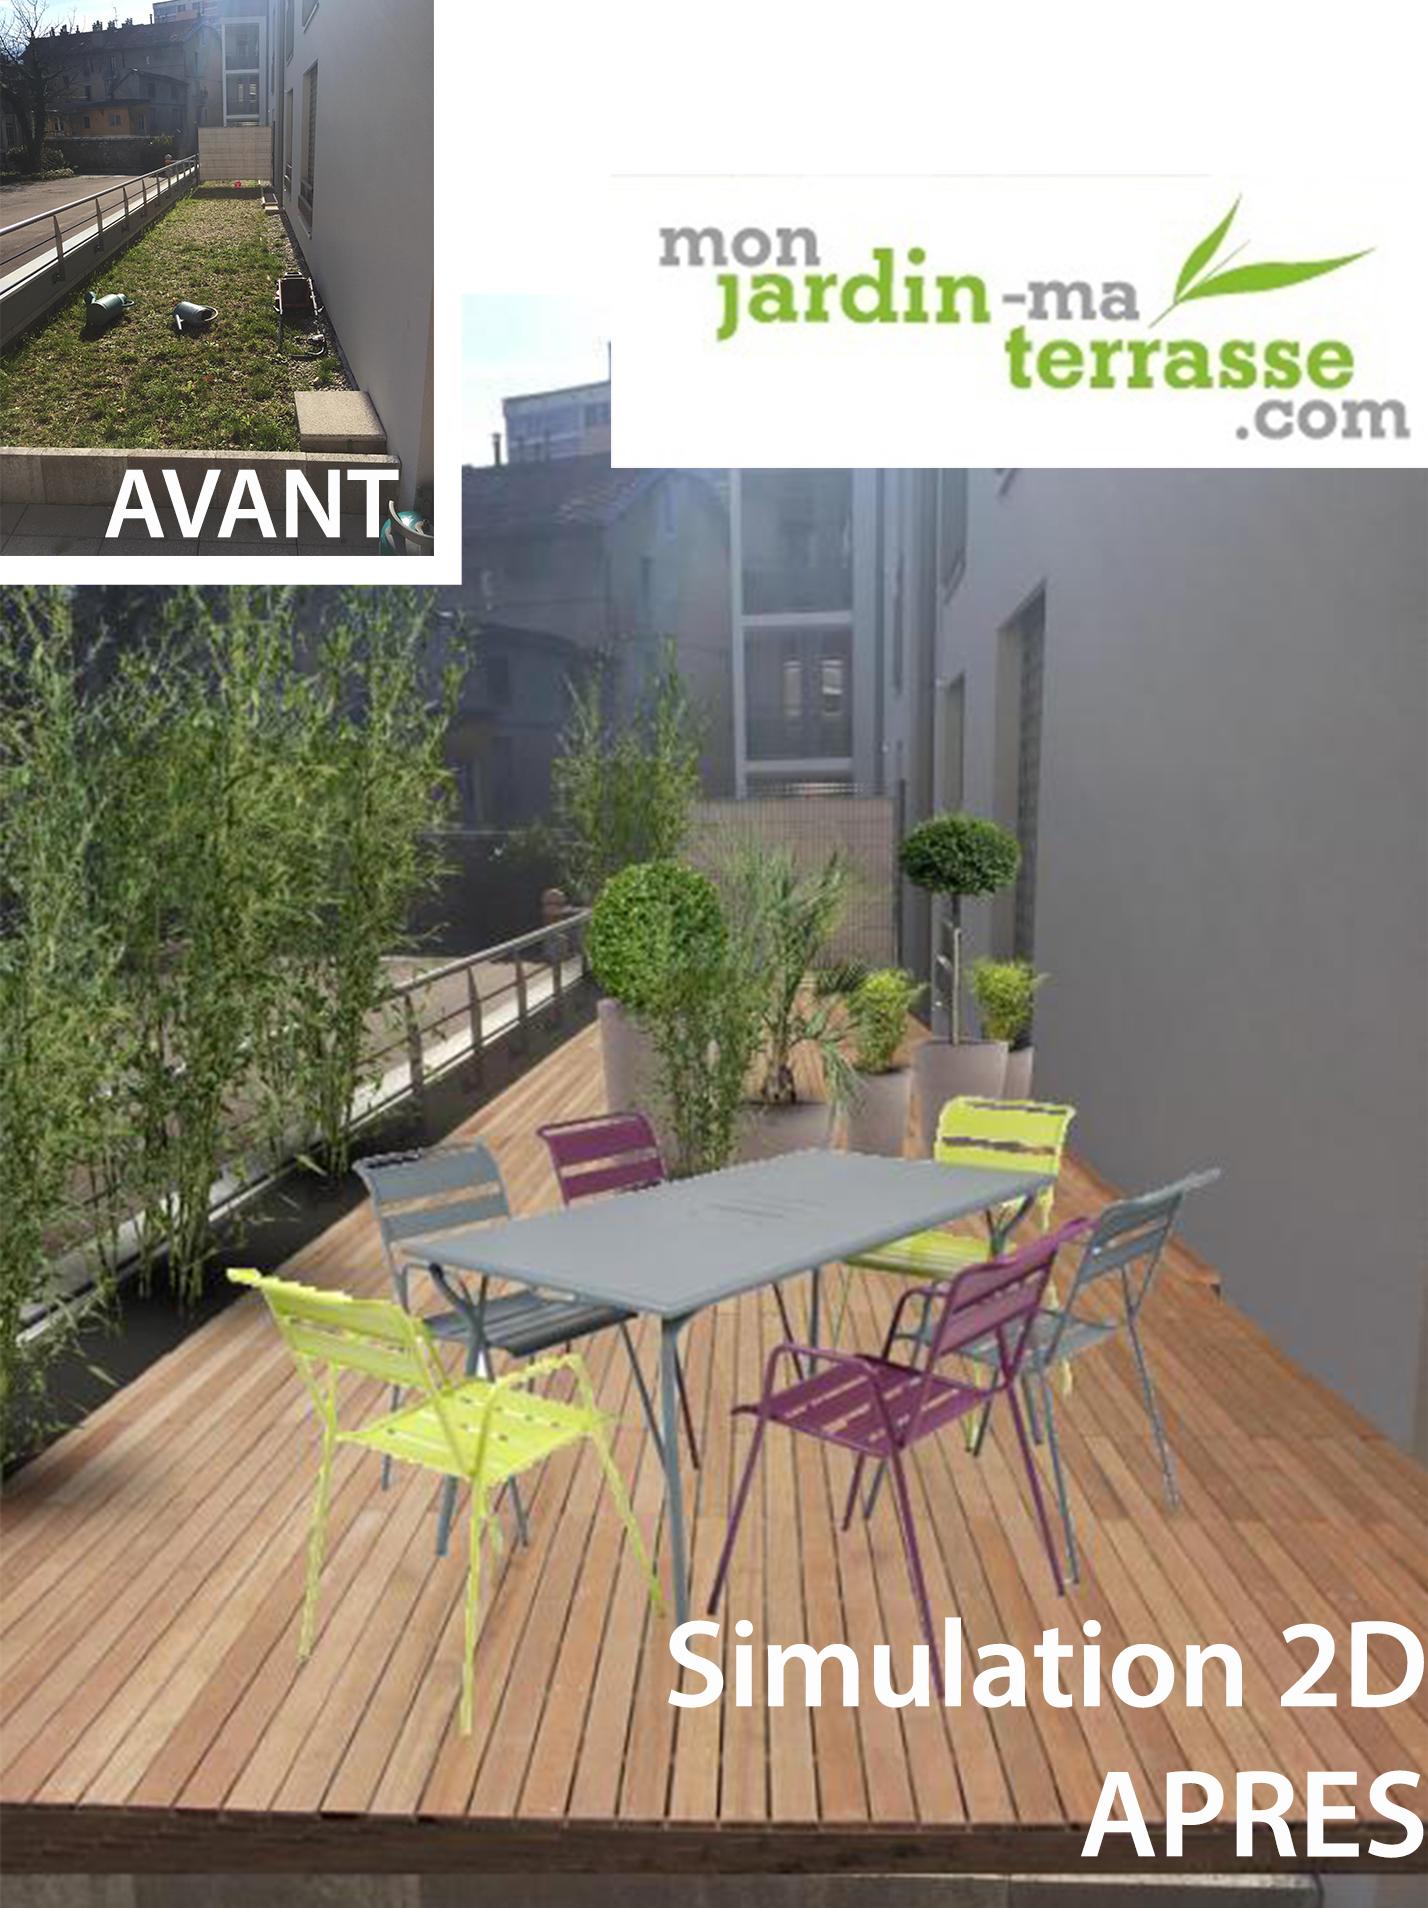 Aménagement du toit terrasse d\'un appartement   monjardin-materrasse.com